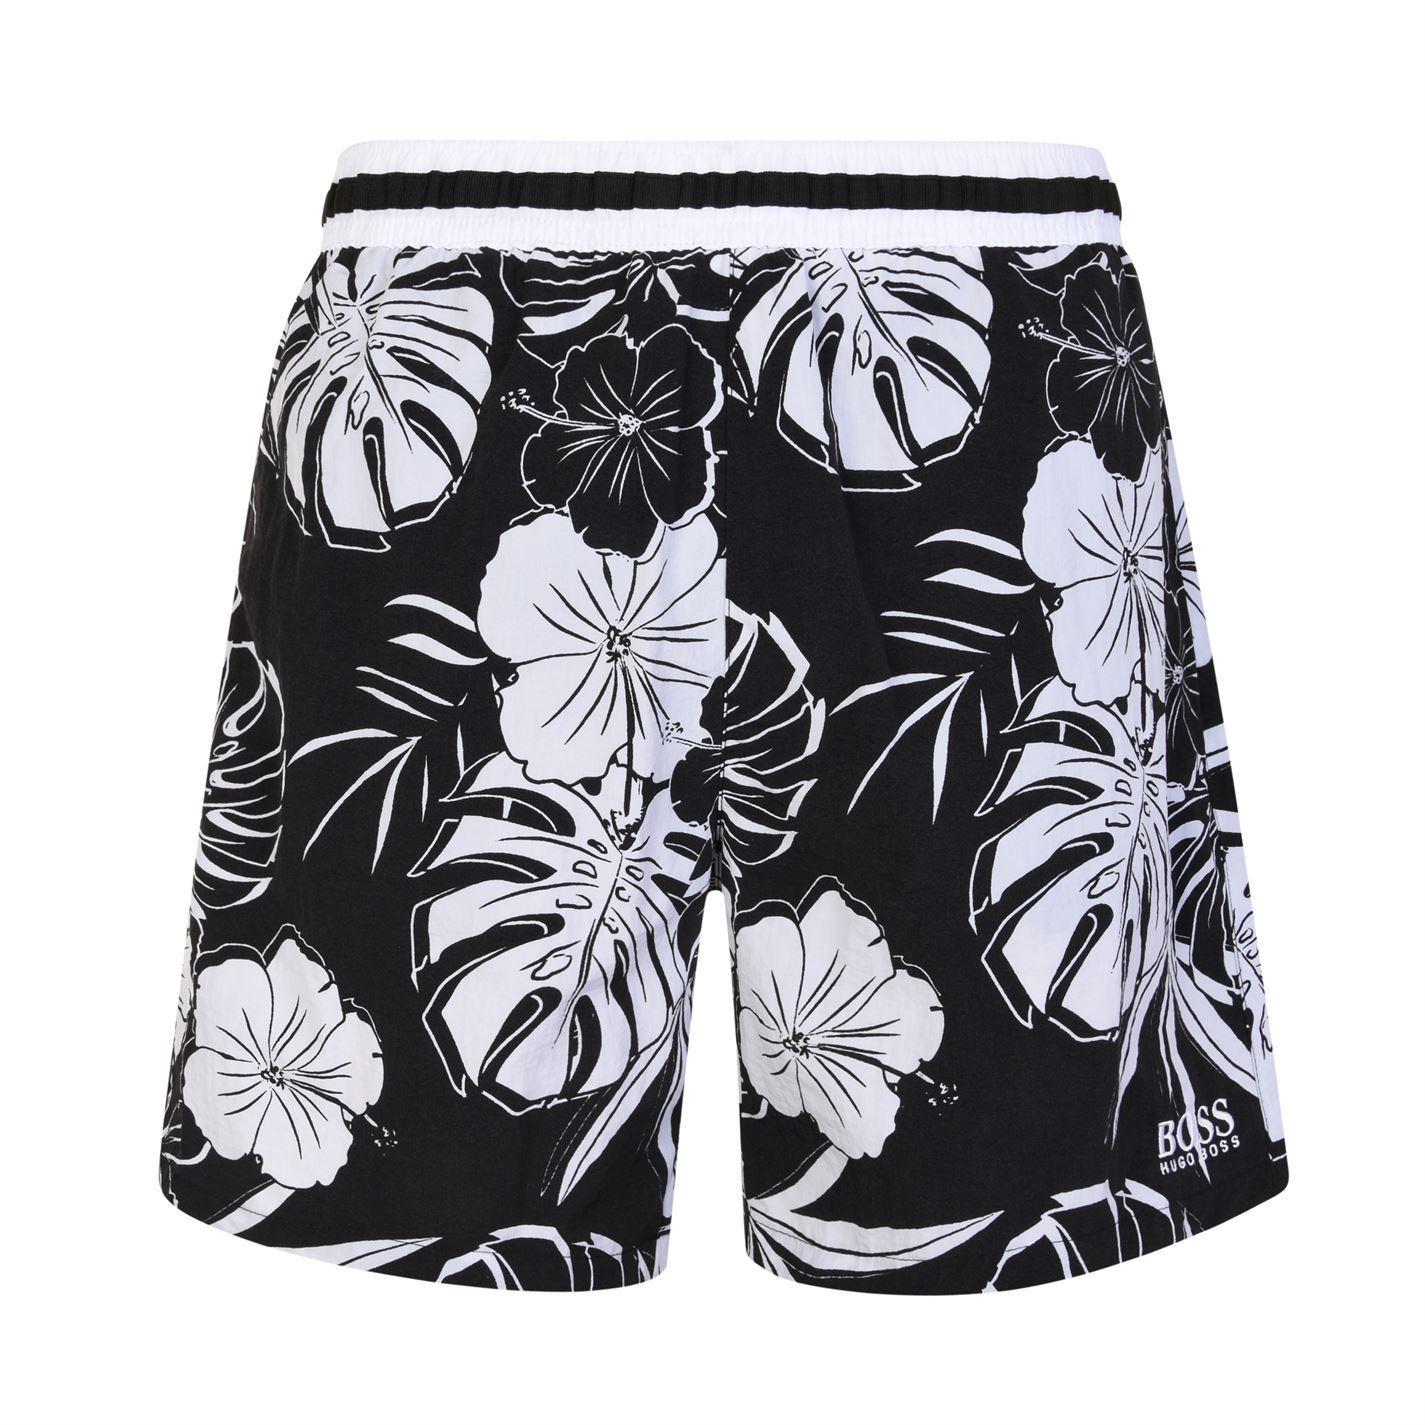 0b16dae73 Lyst - BOSS by Hugo Boss Quick Dry Tropical Print Swim Shorts in ...